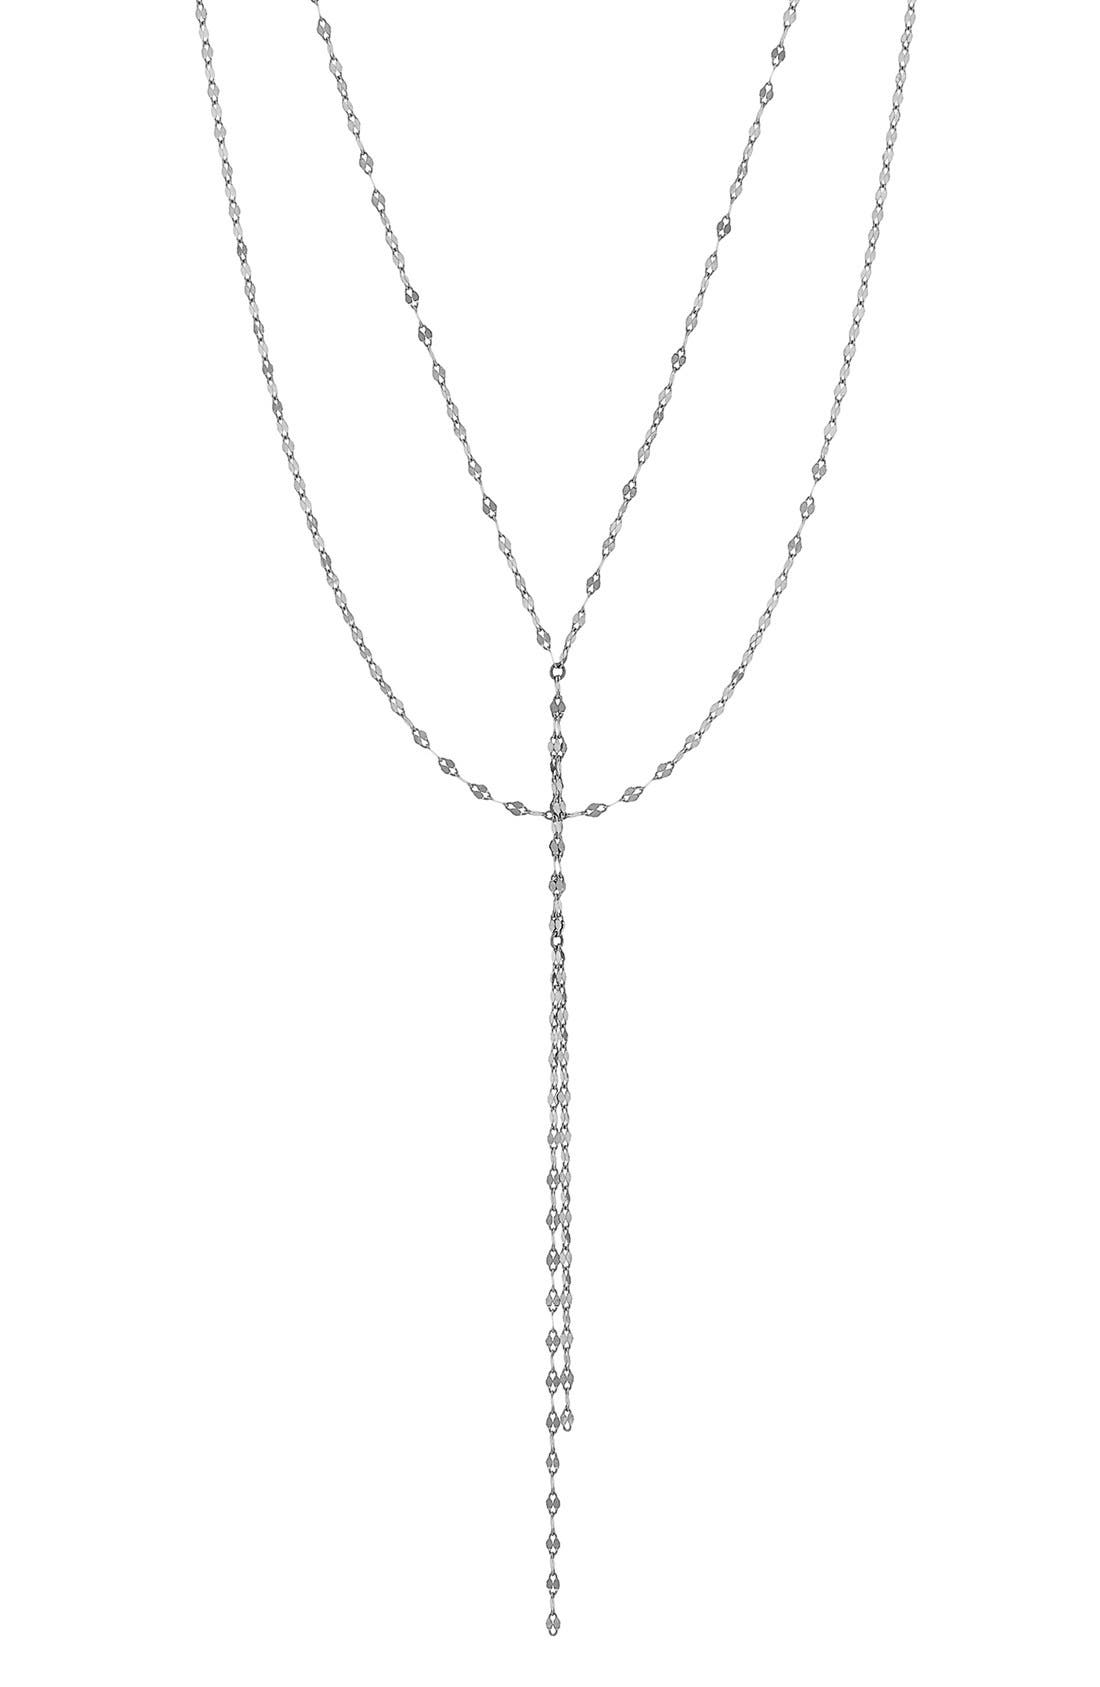 Alternate Image 1 Selected - Lana Jewelry 'Blake' Lariat Necklace